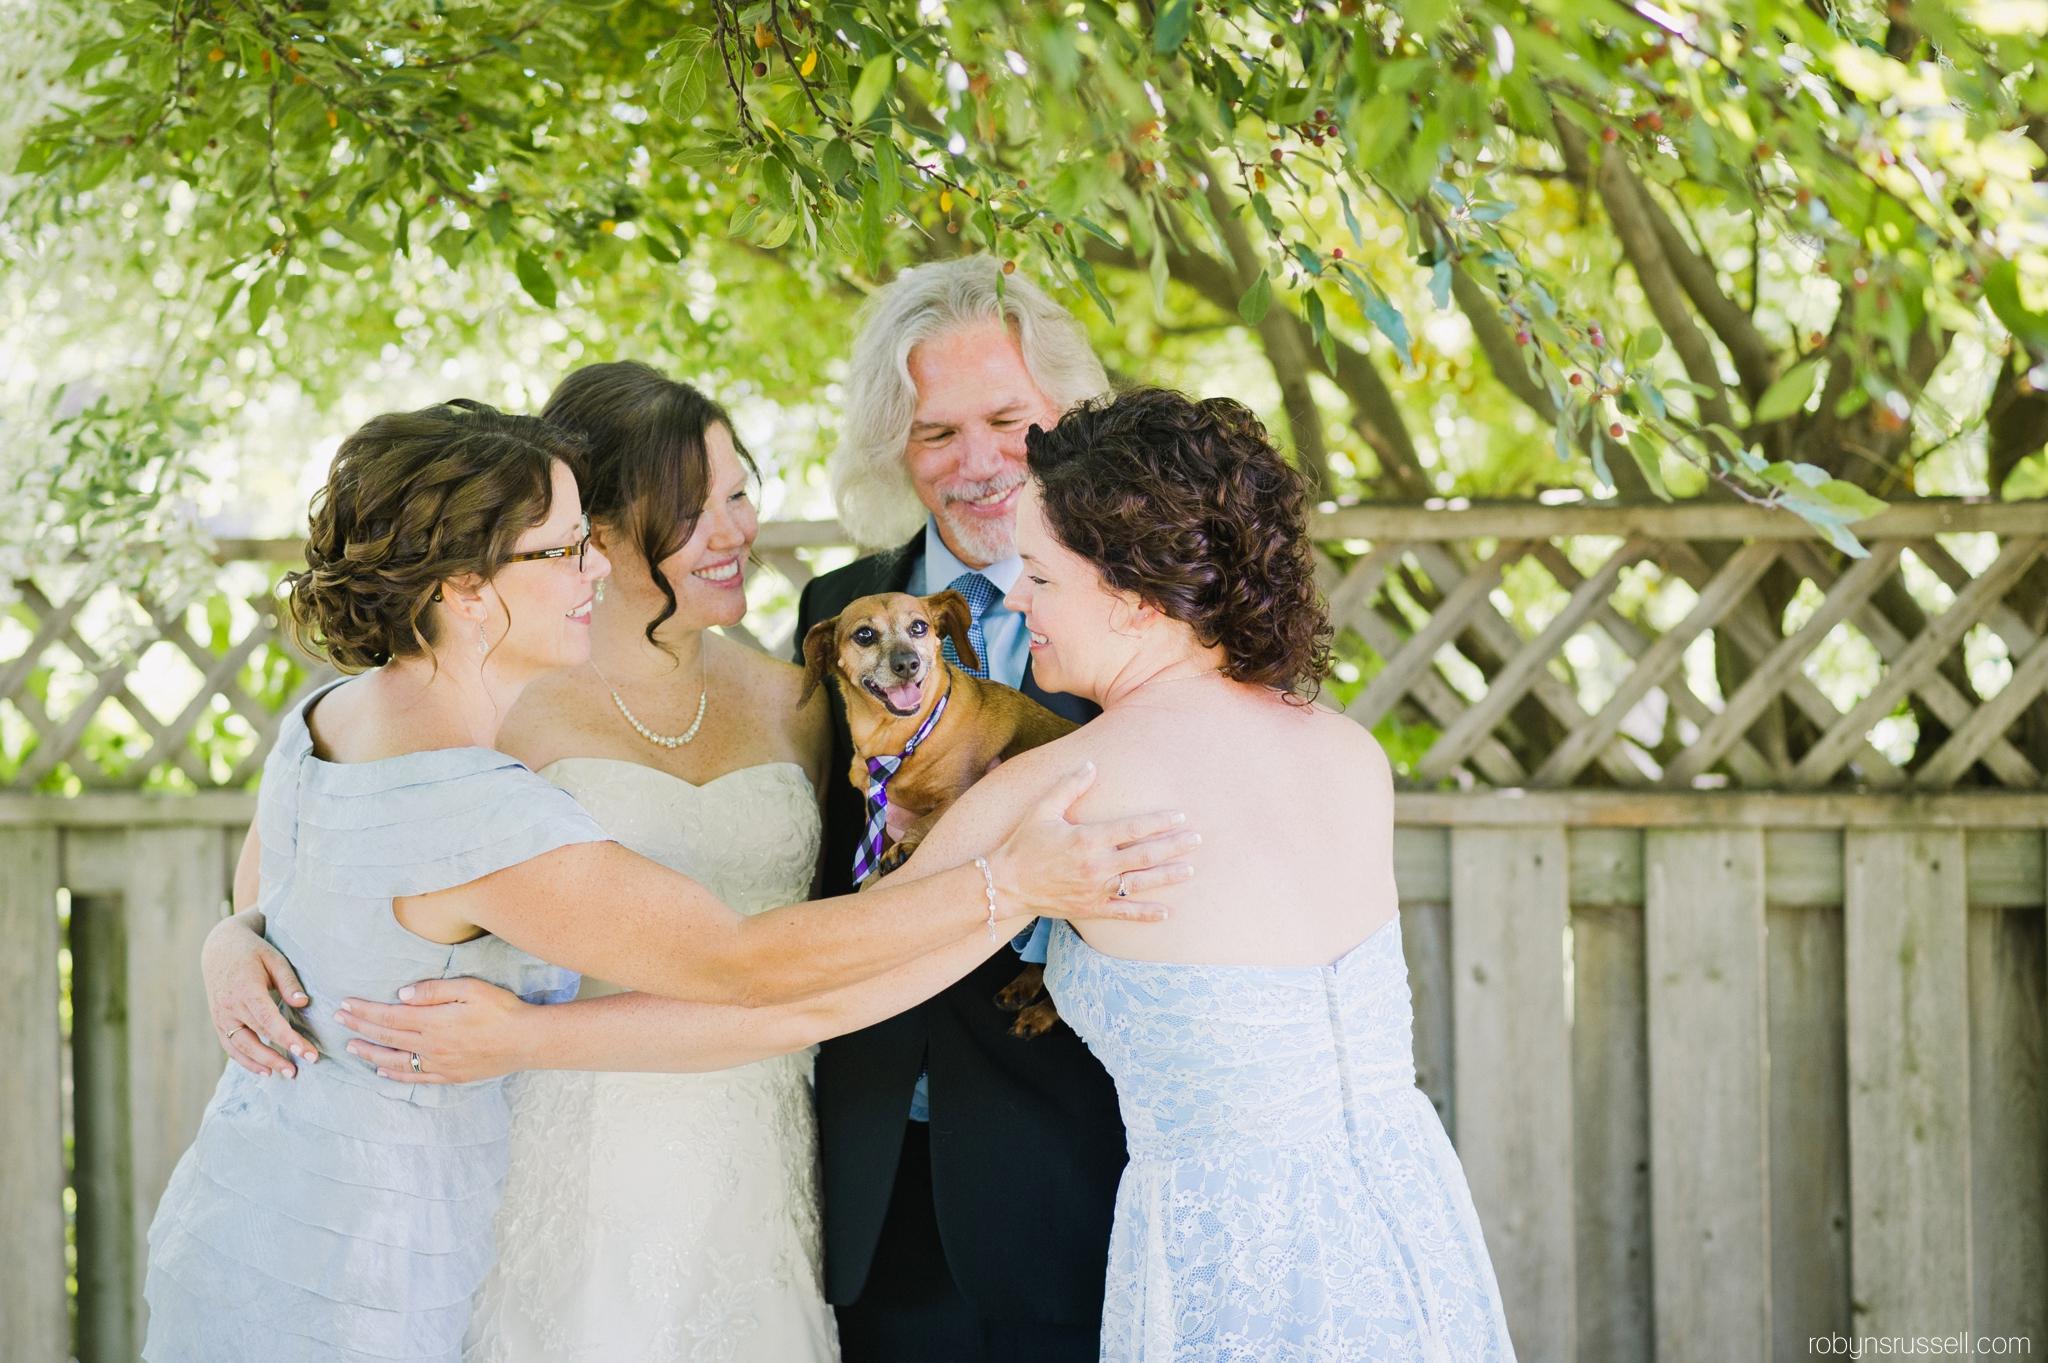 6-cute-family-burlington-murphy-the-dog.jpg